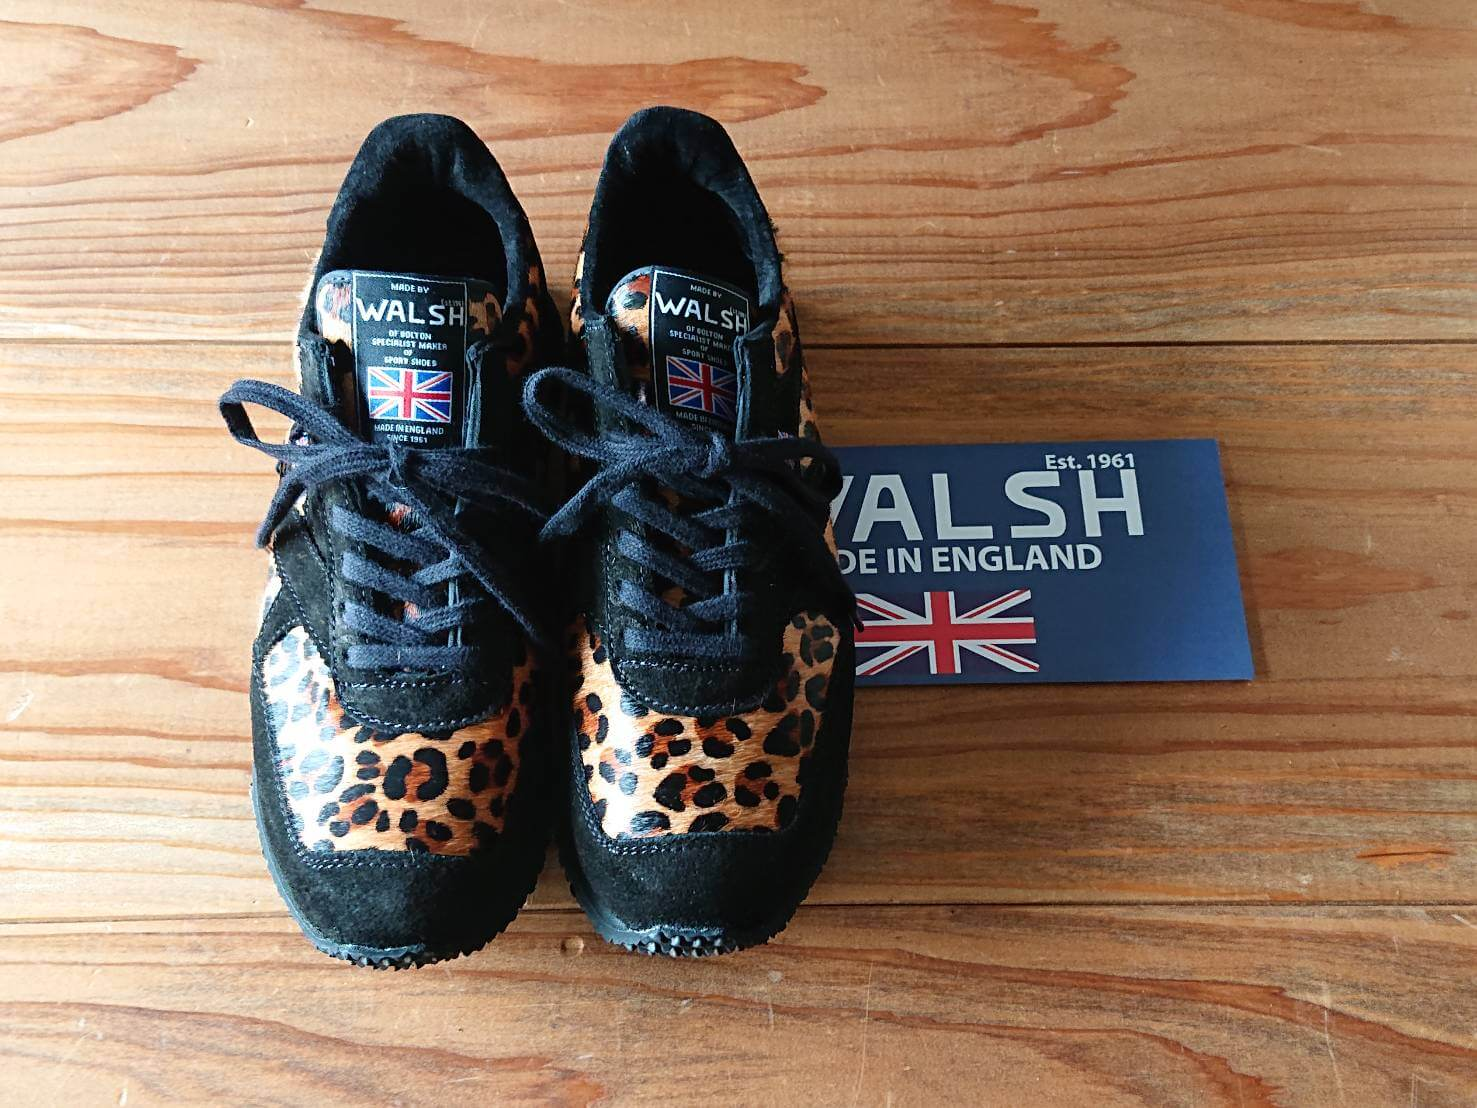 WALSH 英国製スニーカー 2021AW NEW DESIGN